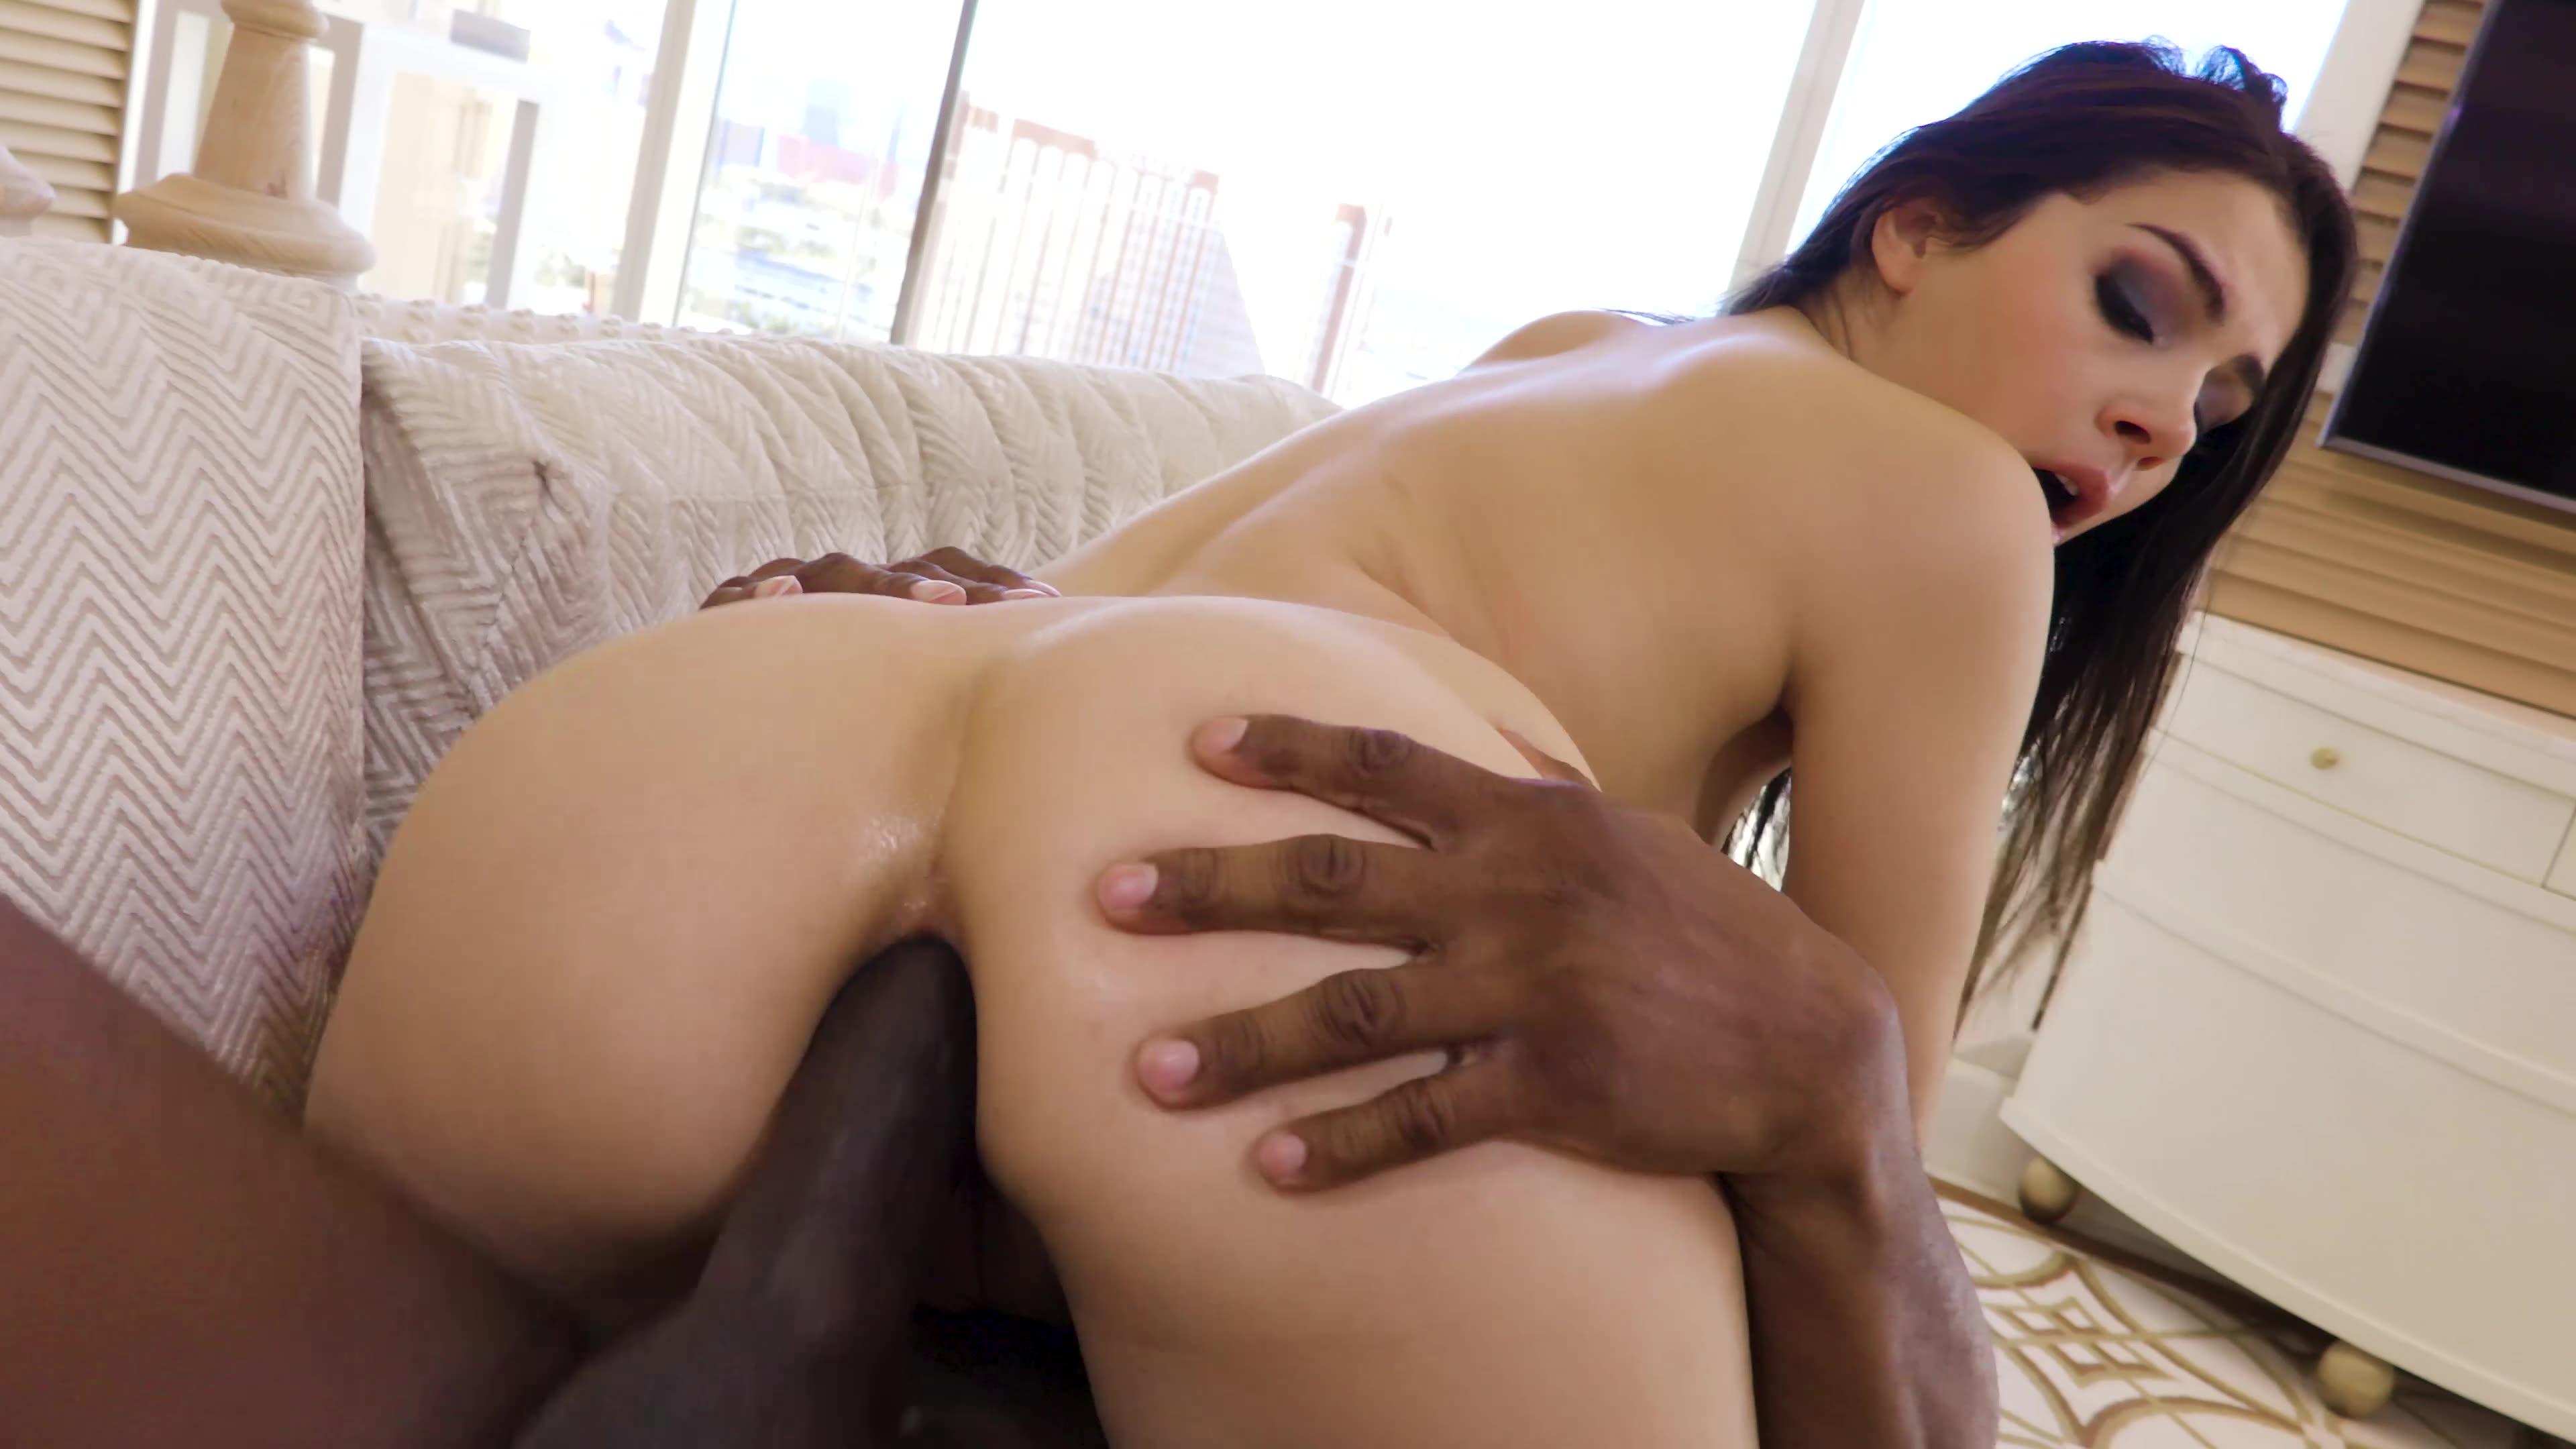 New porn 2020 Big dick double penetration